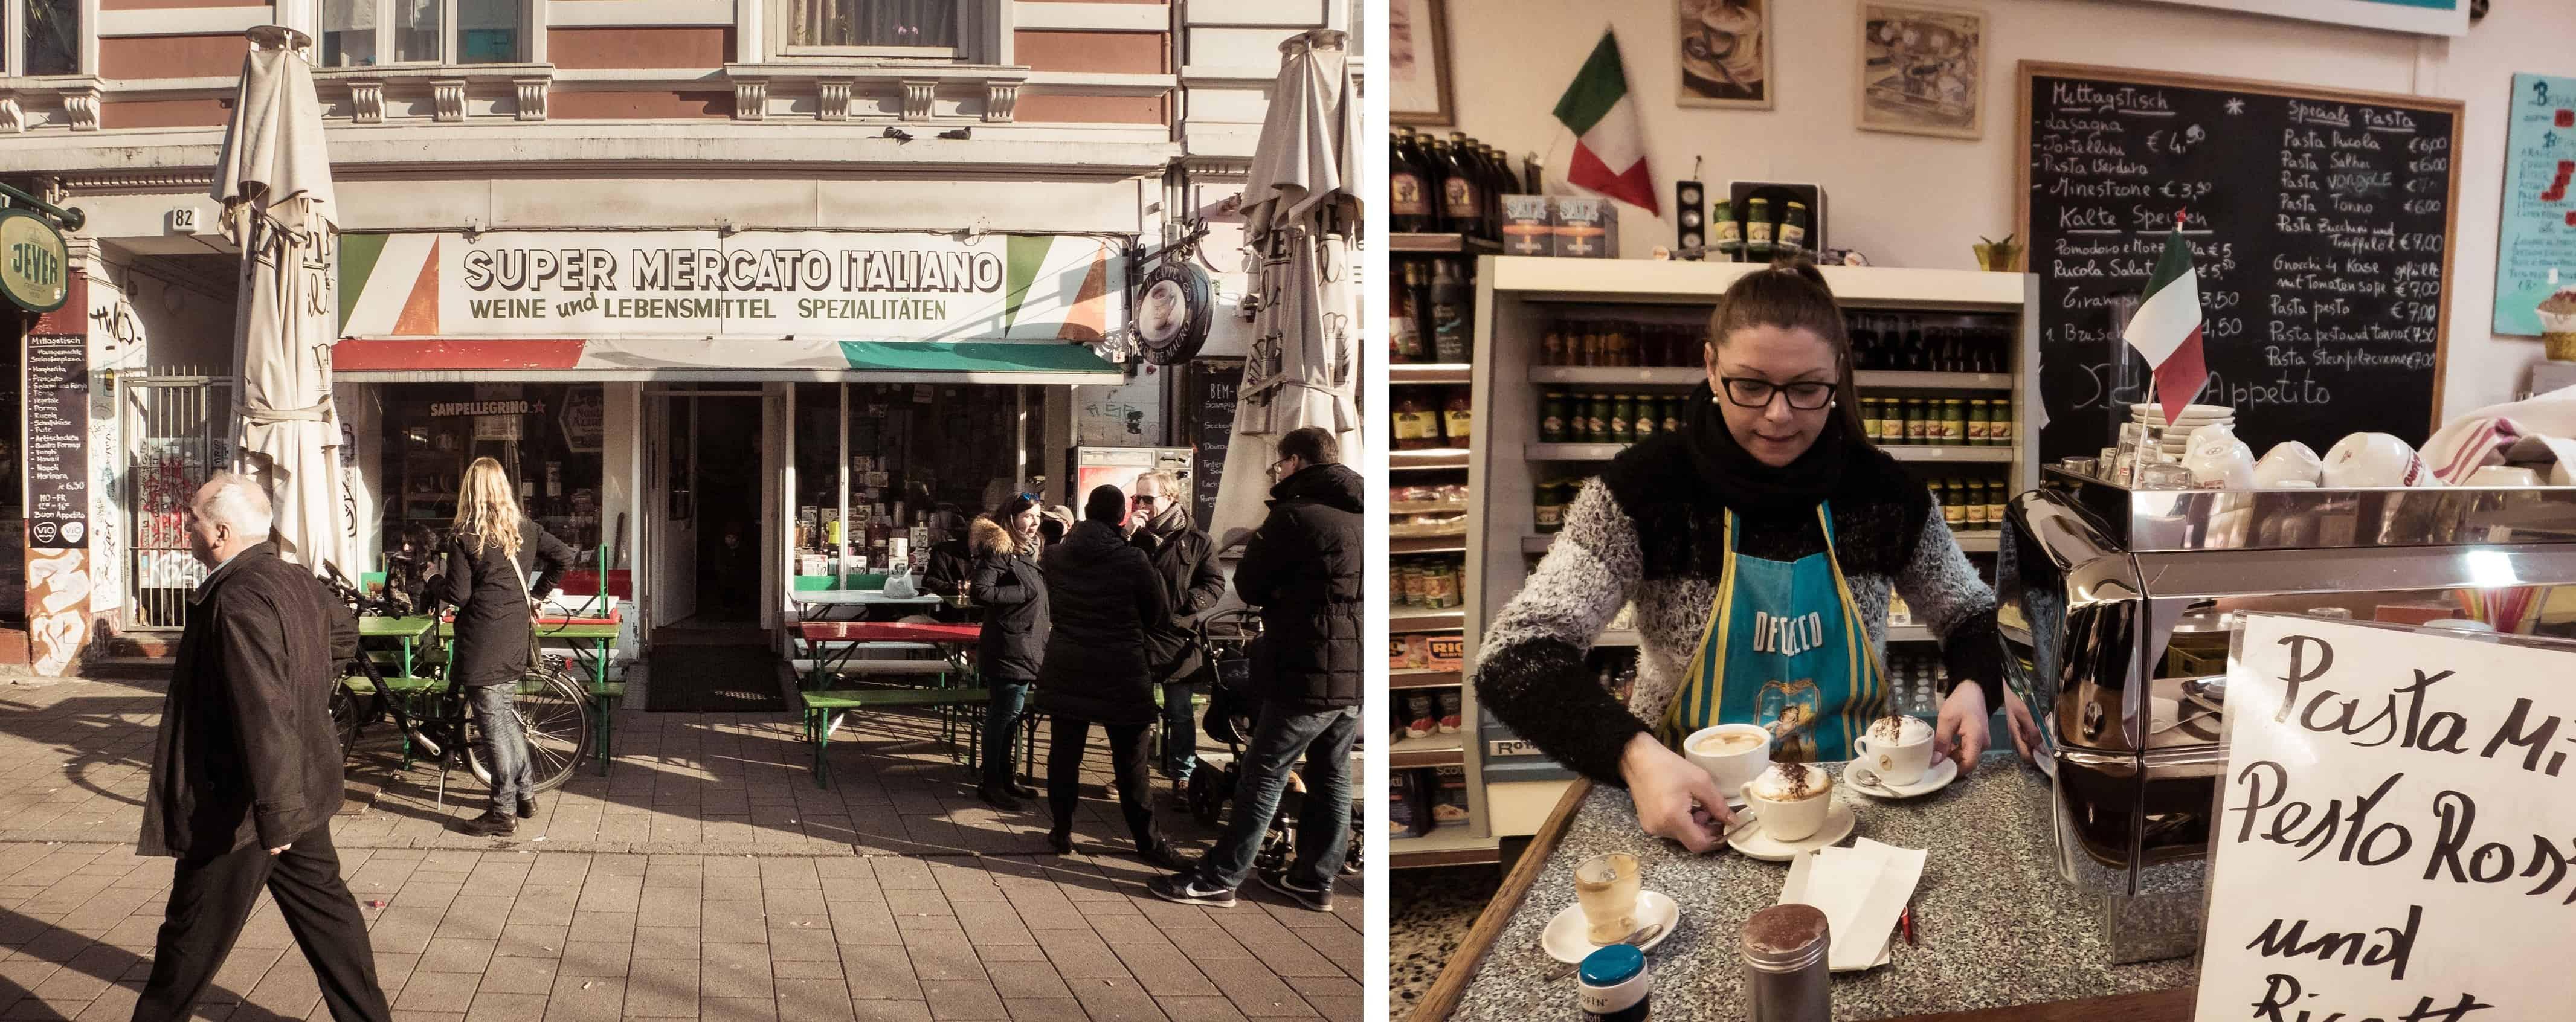 Super Mercato Italiano Hamburg